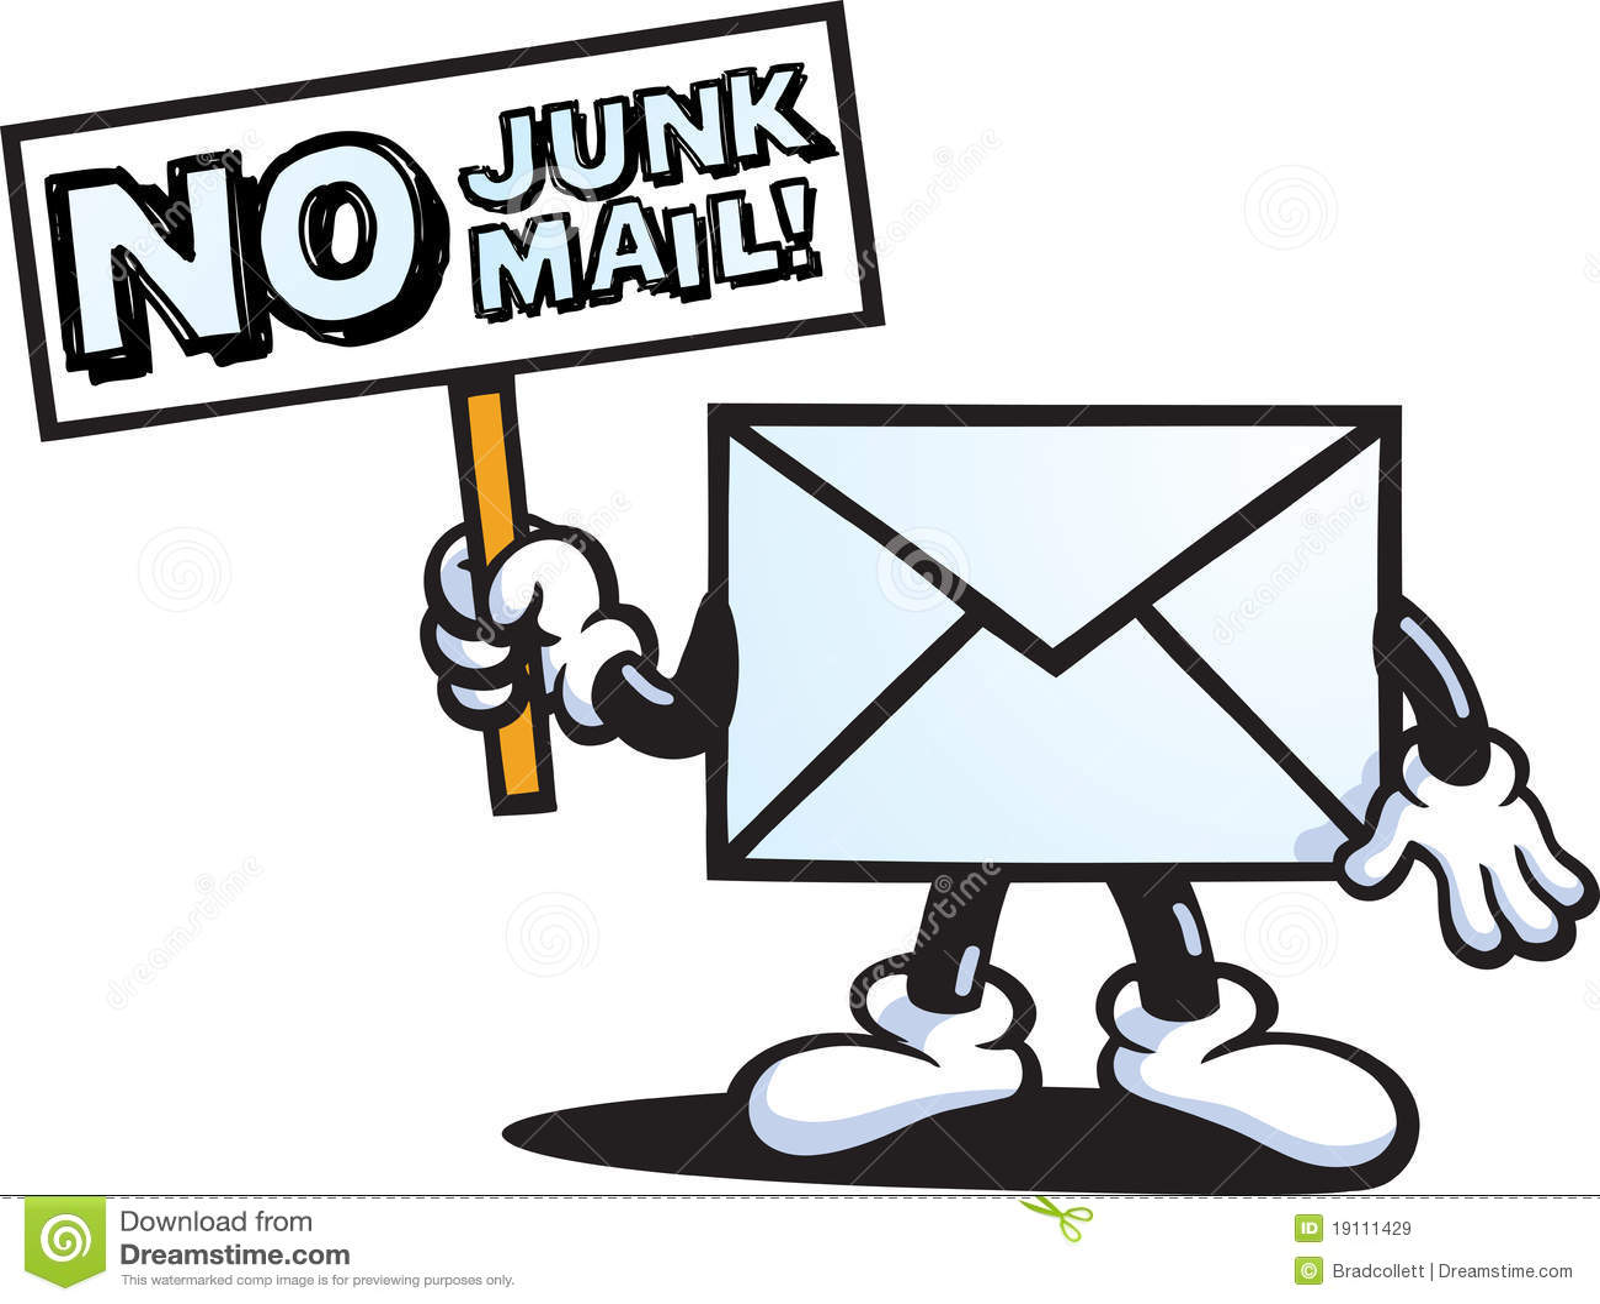 「junk mail」的圖片搜尋結果